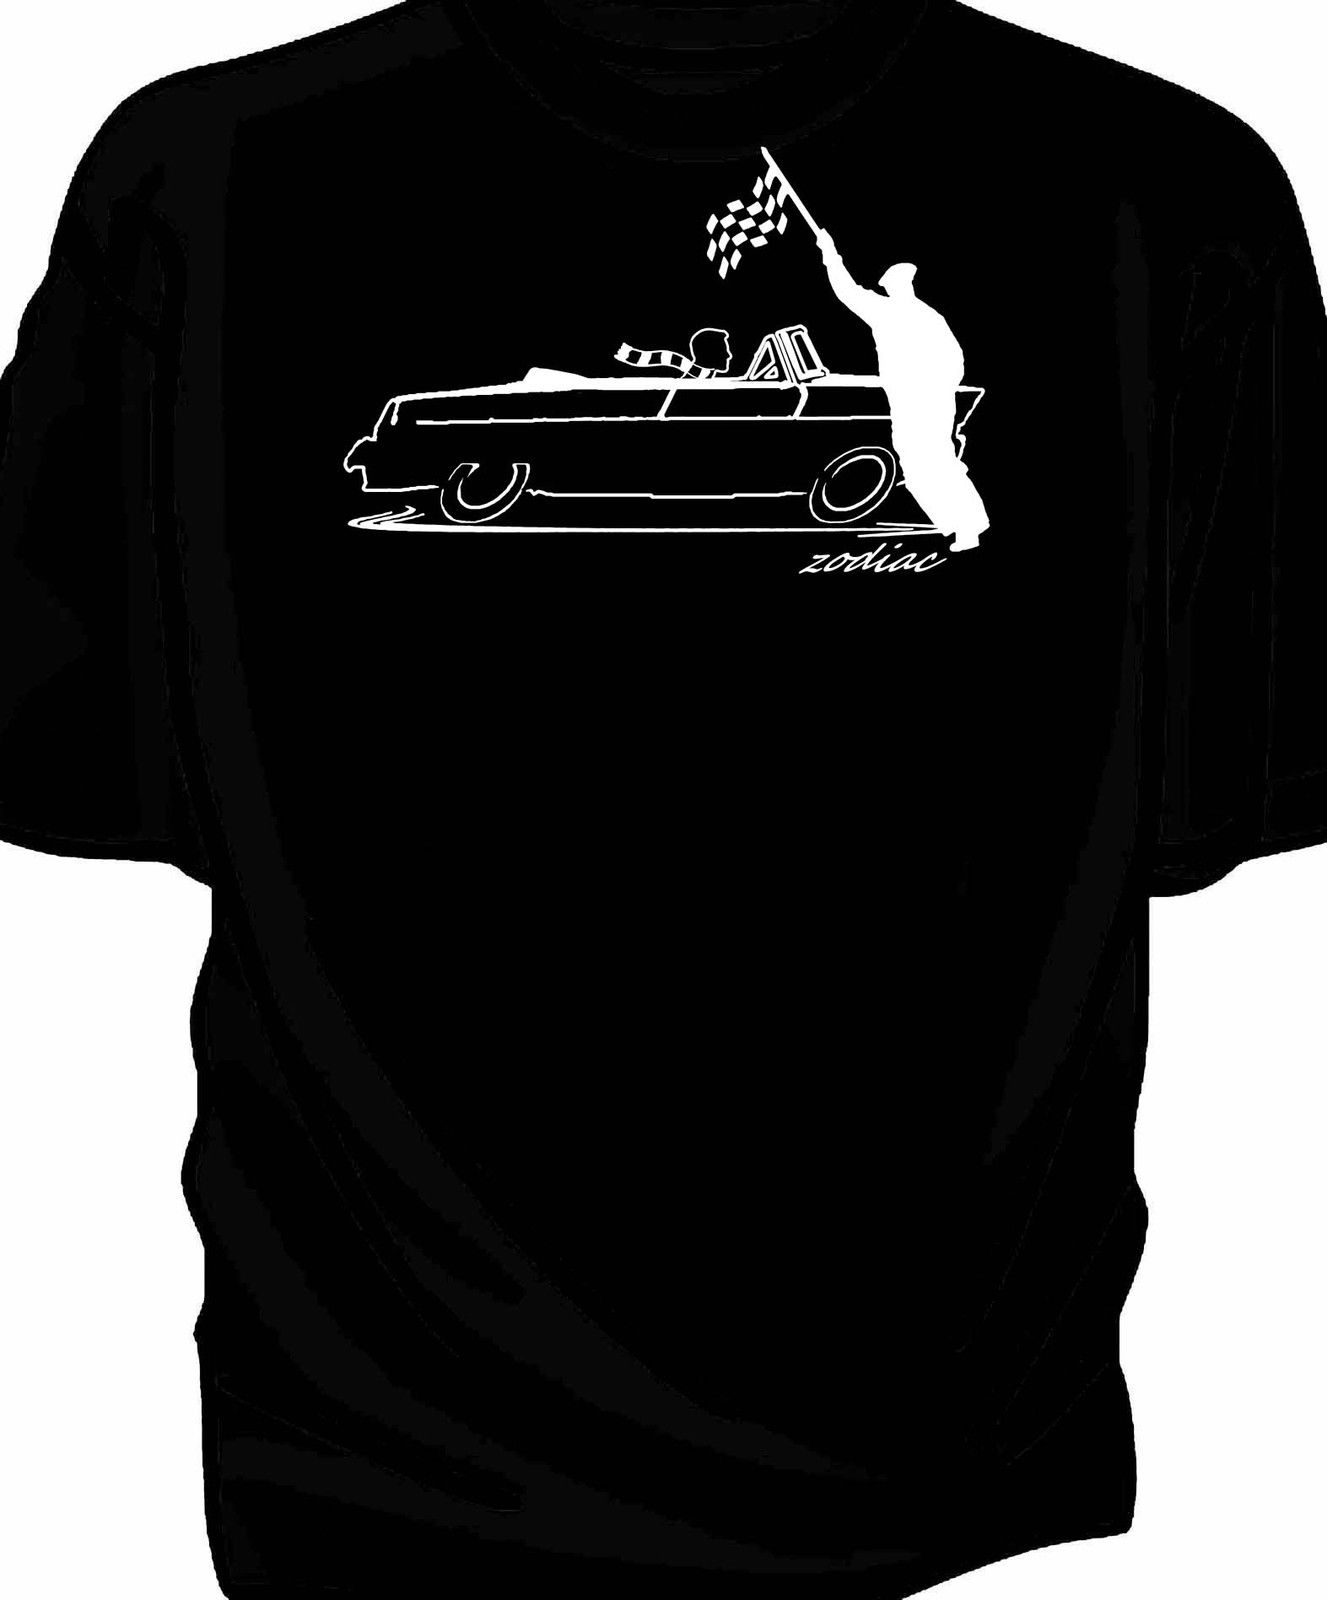 Original sketch Chequered flag retro t-shirt classic Zodiac Mk2 206e 1959 New T Shirts Funny Tops Tee Unisex